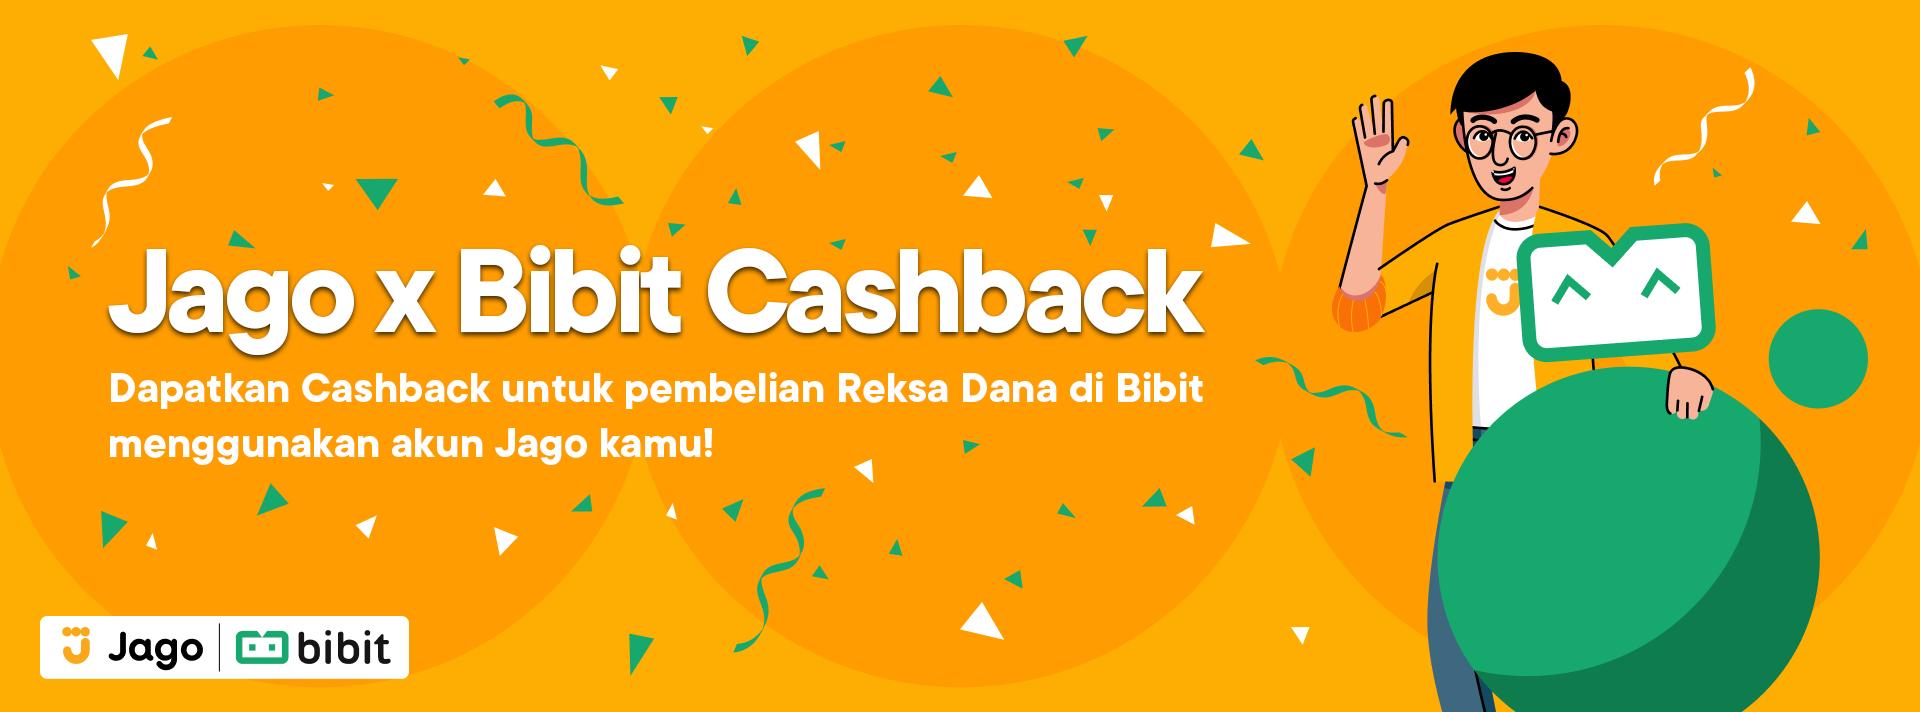 Jago x Bibit Cashback